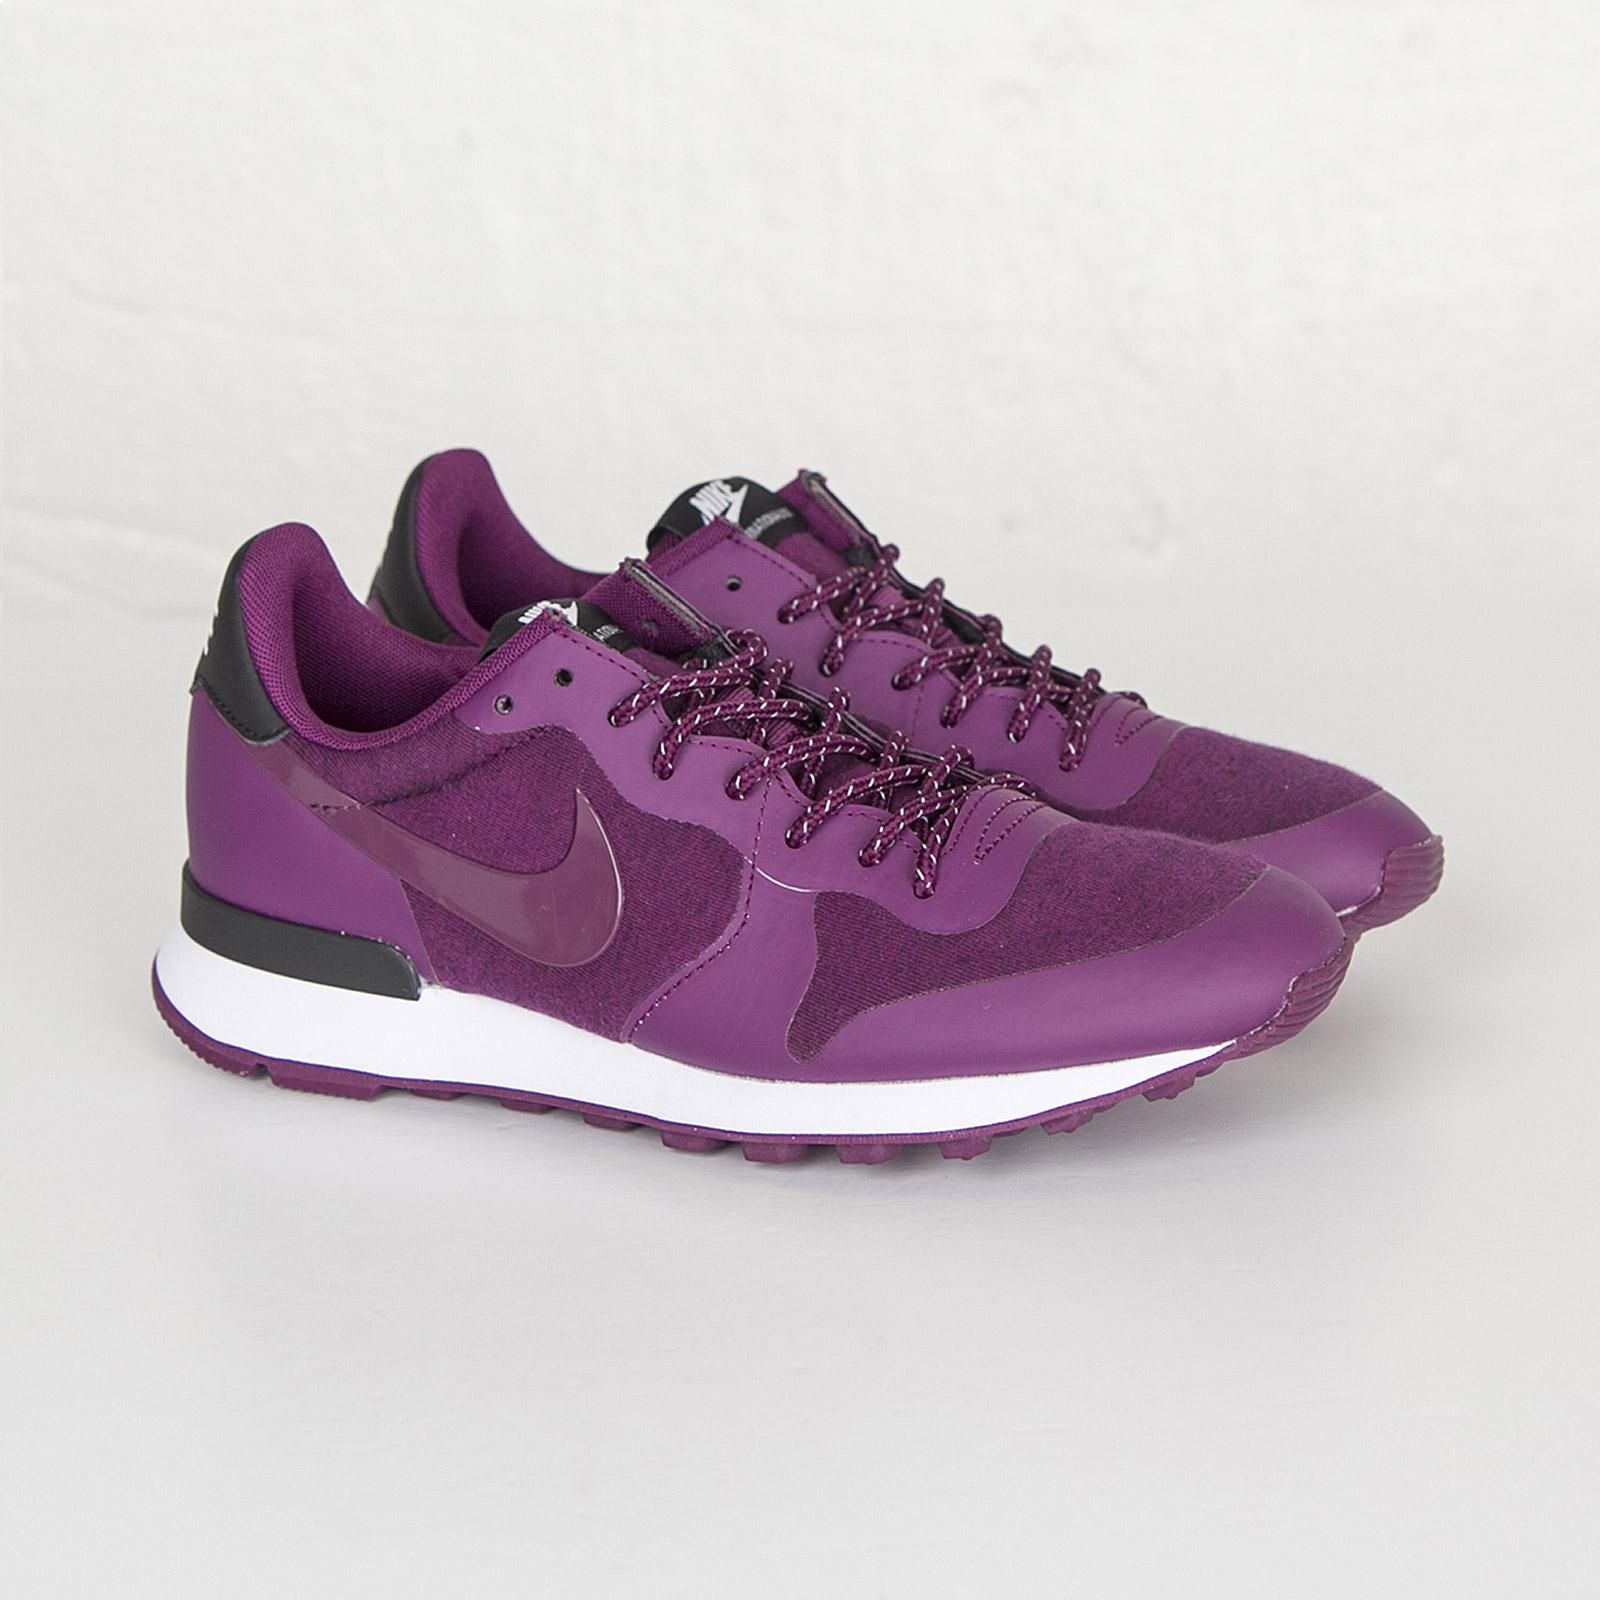 design intemporel b9a9e 7a2c6 Nike W Internationalist TP - 749556-500 - Sneakersnstuff ...